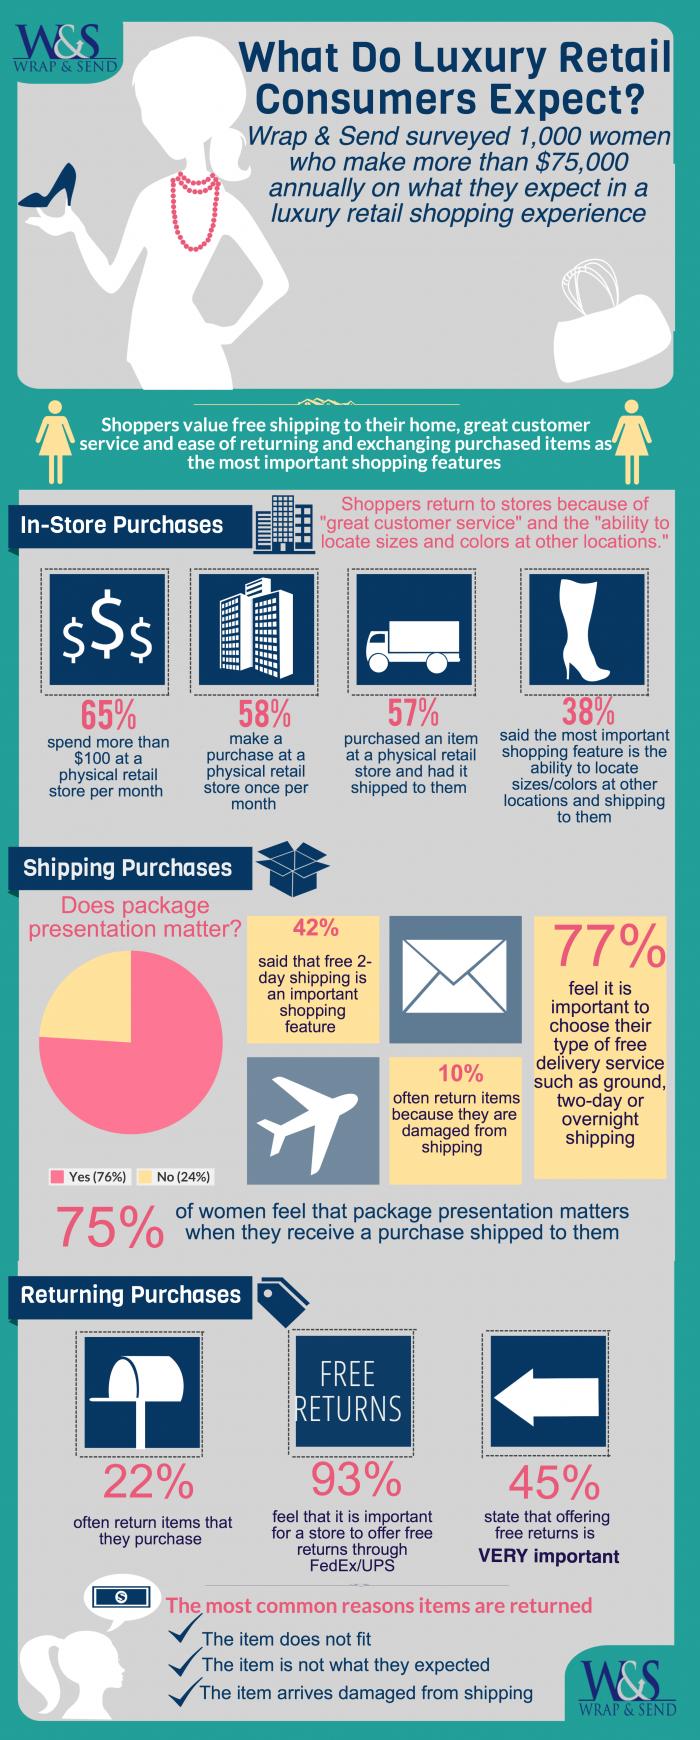 Wrap & Send Luxury Retail Survey v7 and final